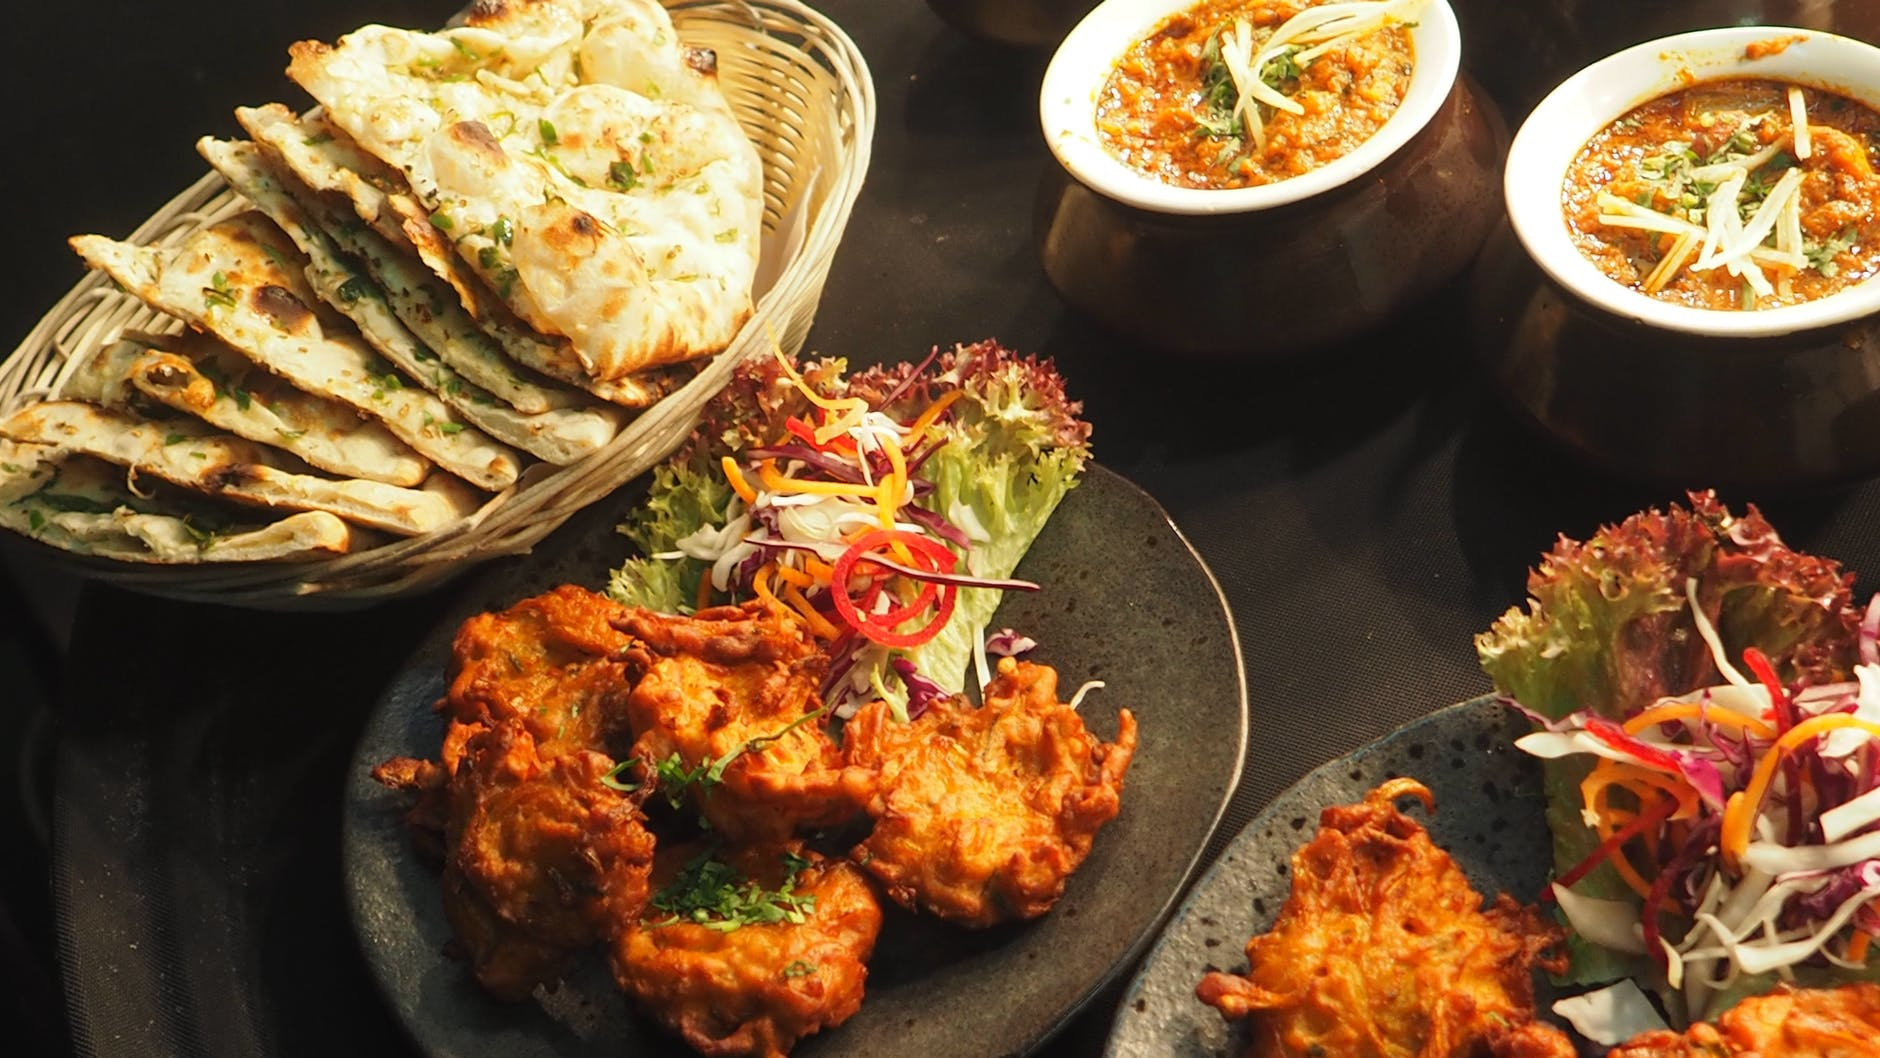 Grill Indian restaurant in Croatia